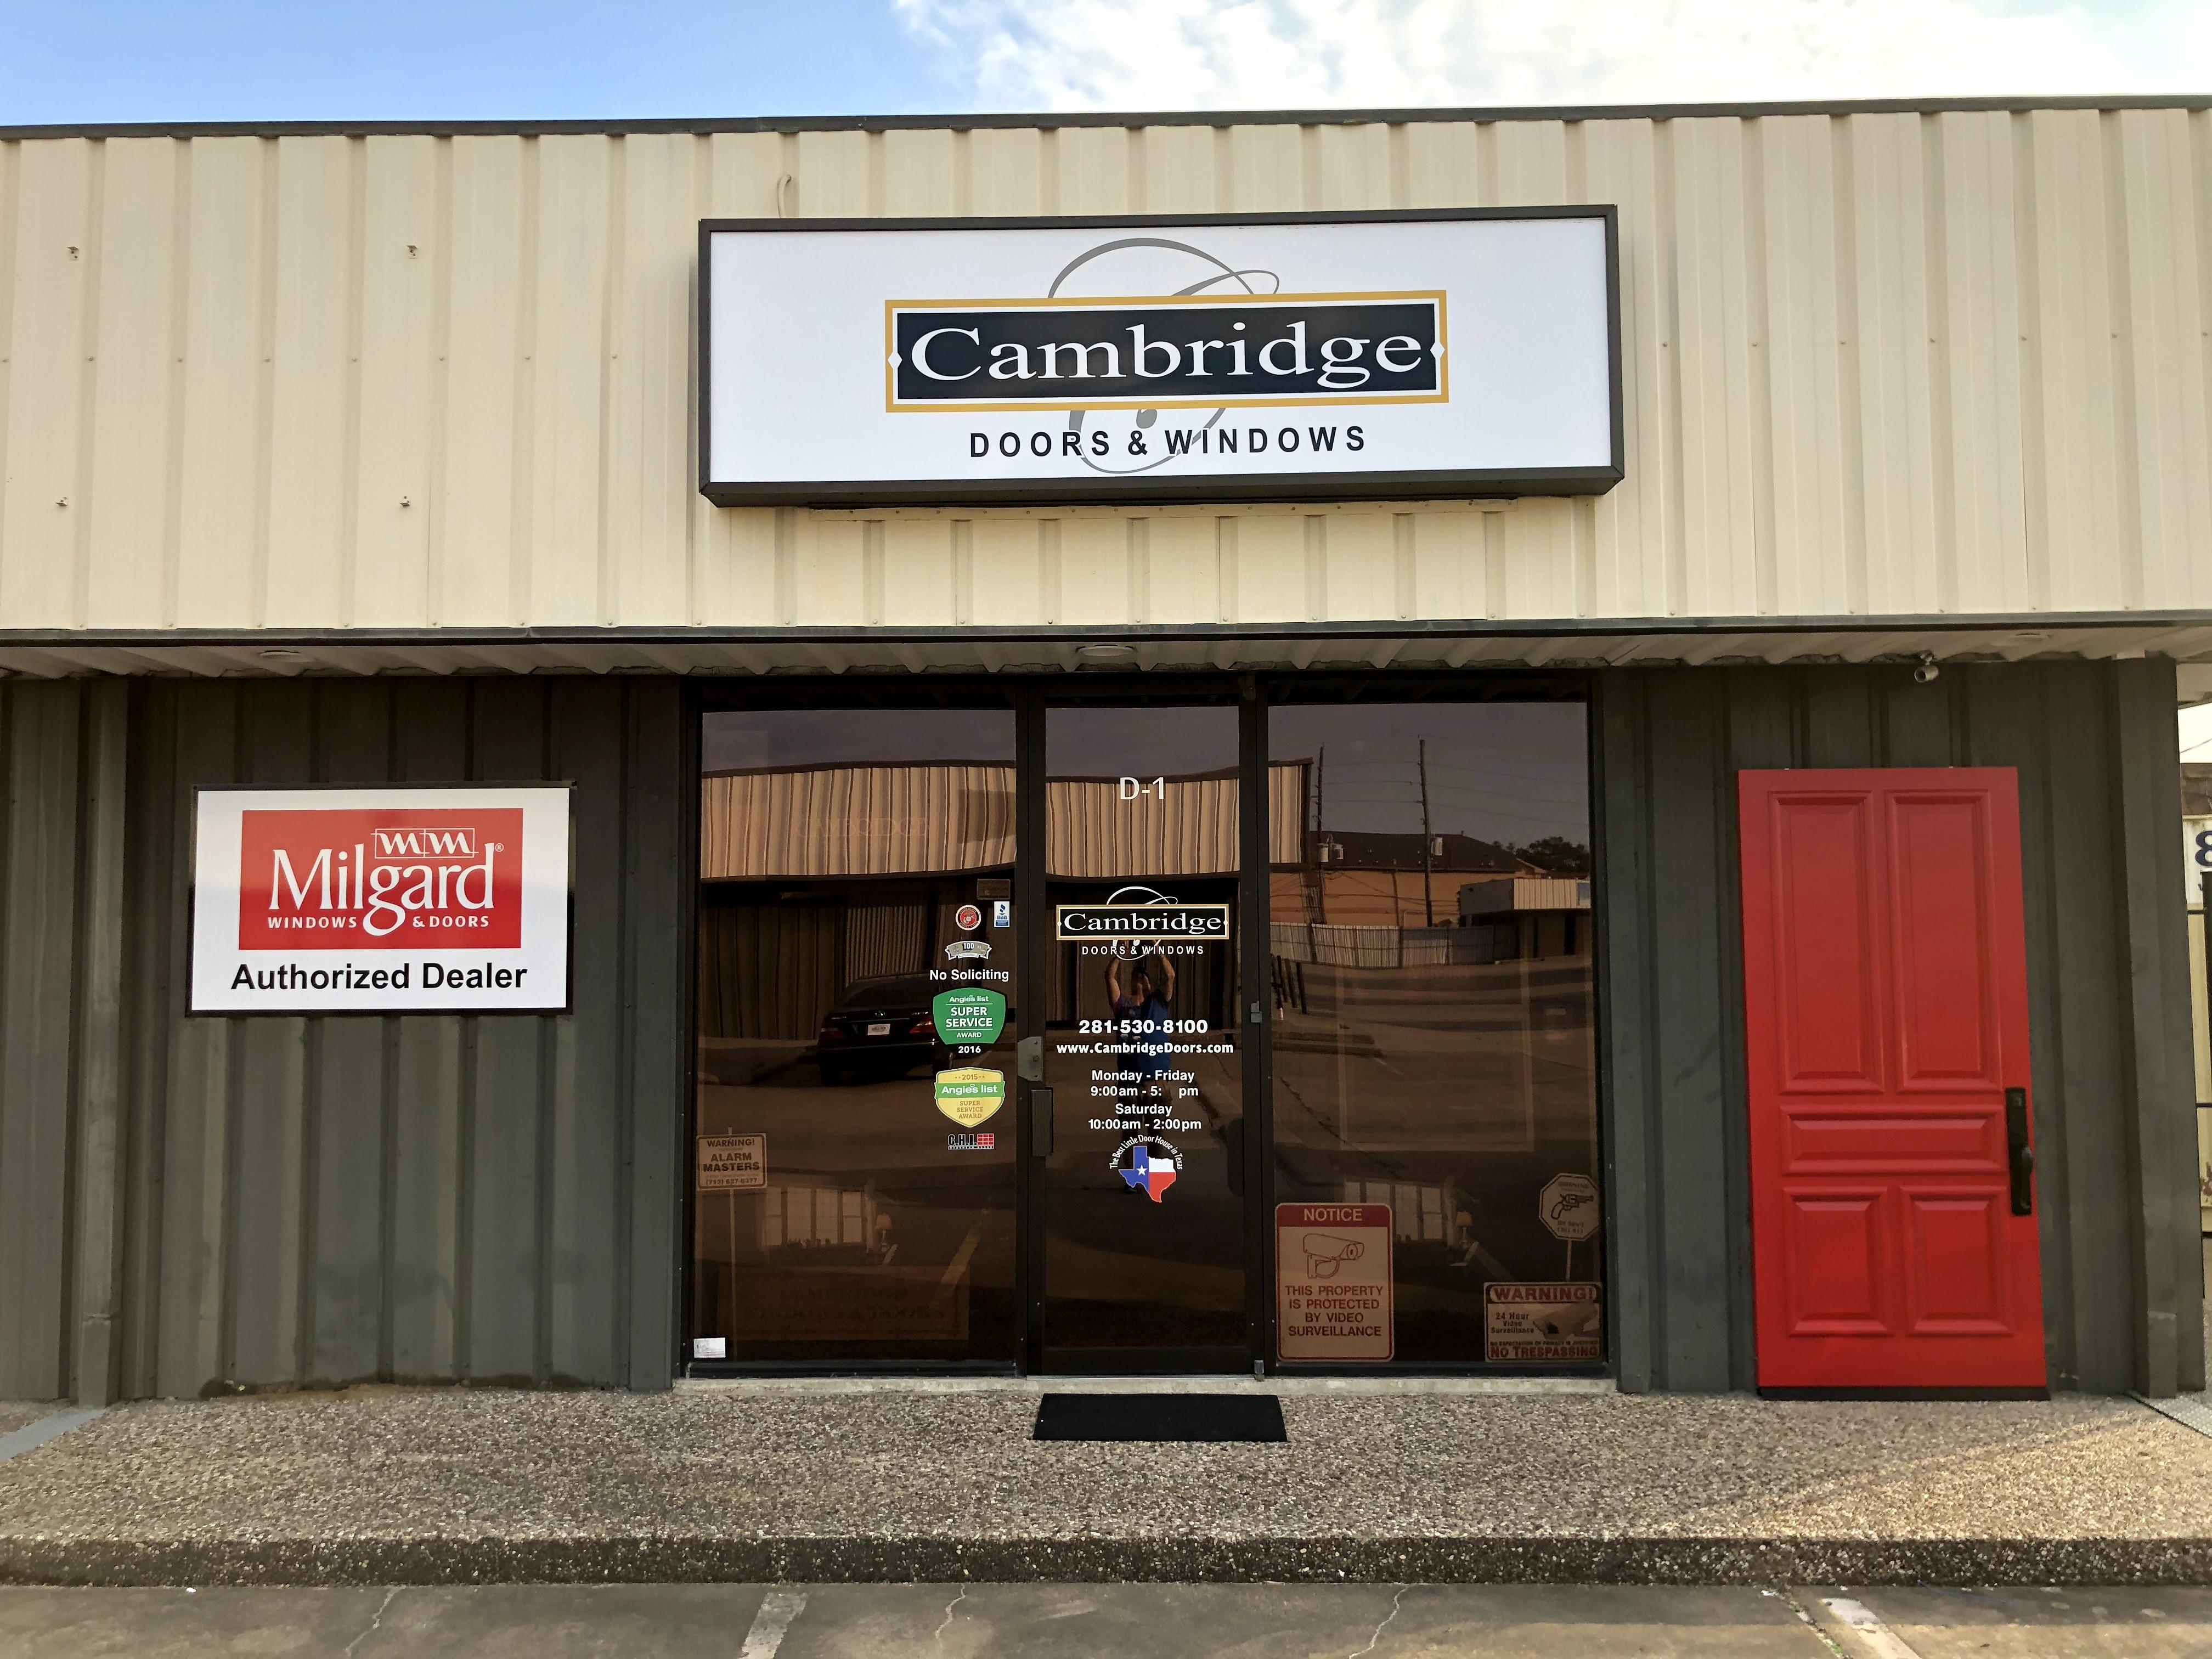 Cambrisge Doors & Windows based in Stafford Texas